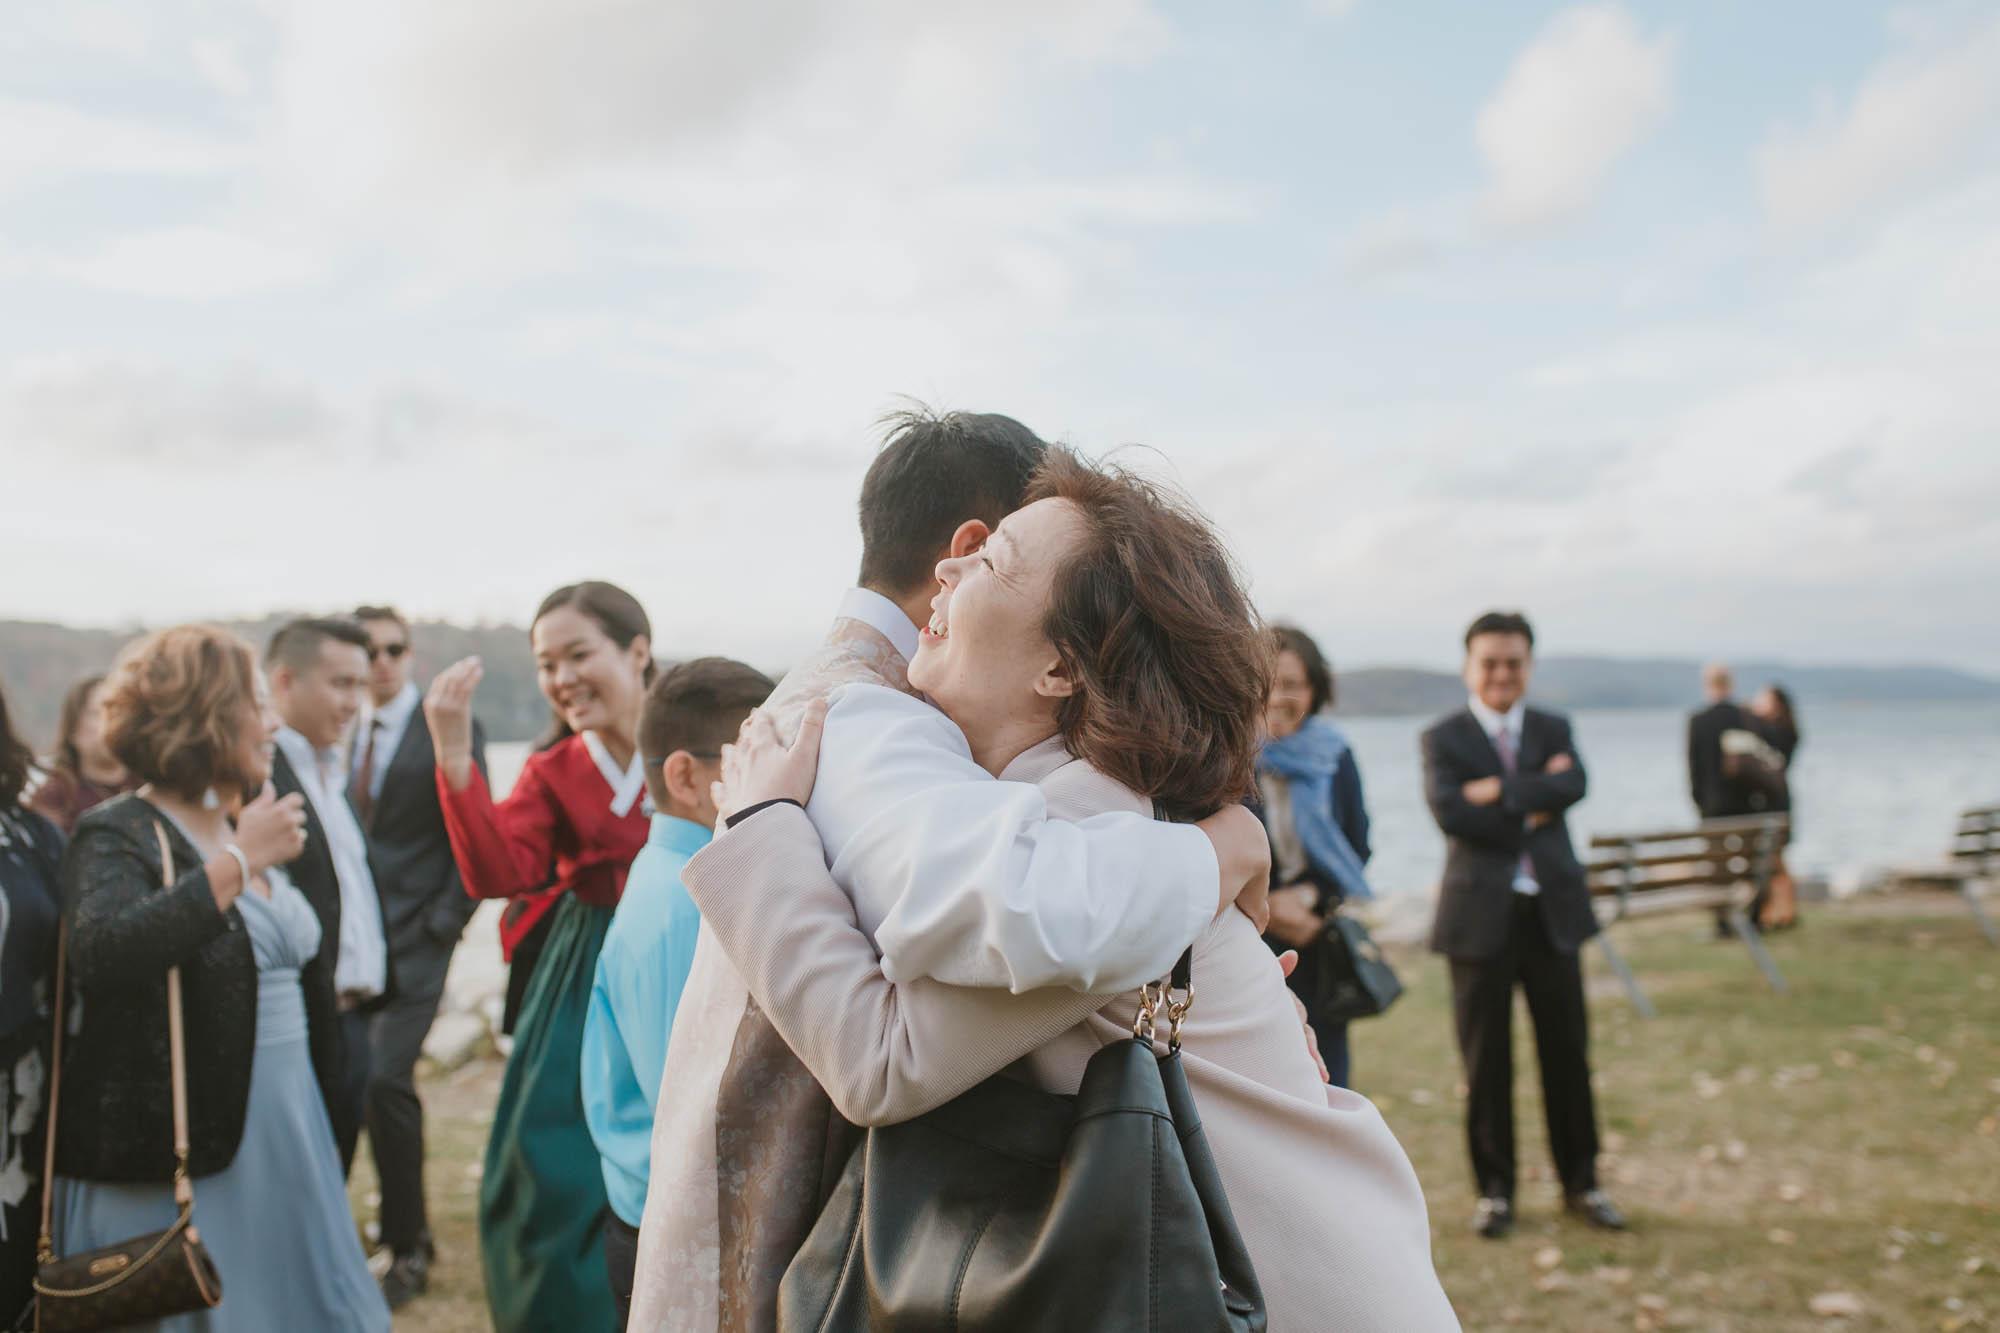 hastings-on-hudson-wedding-photographer-22.jpg